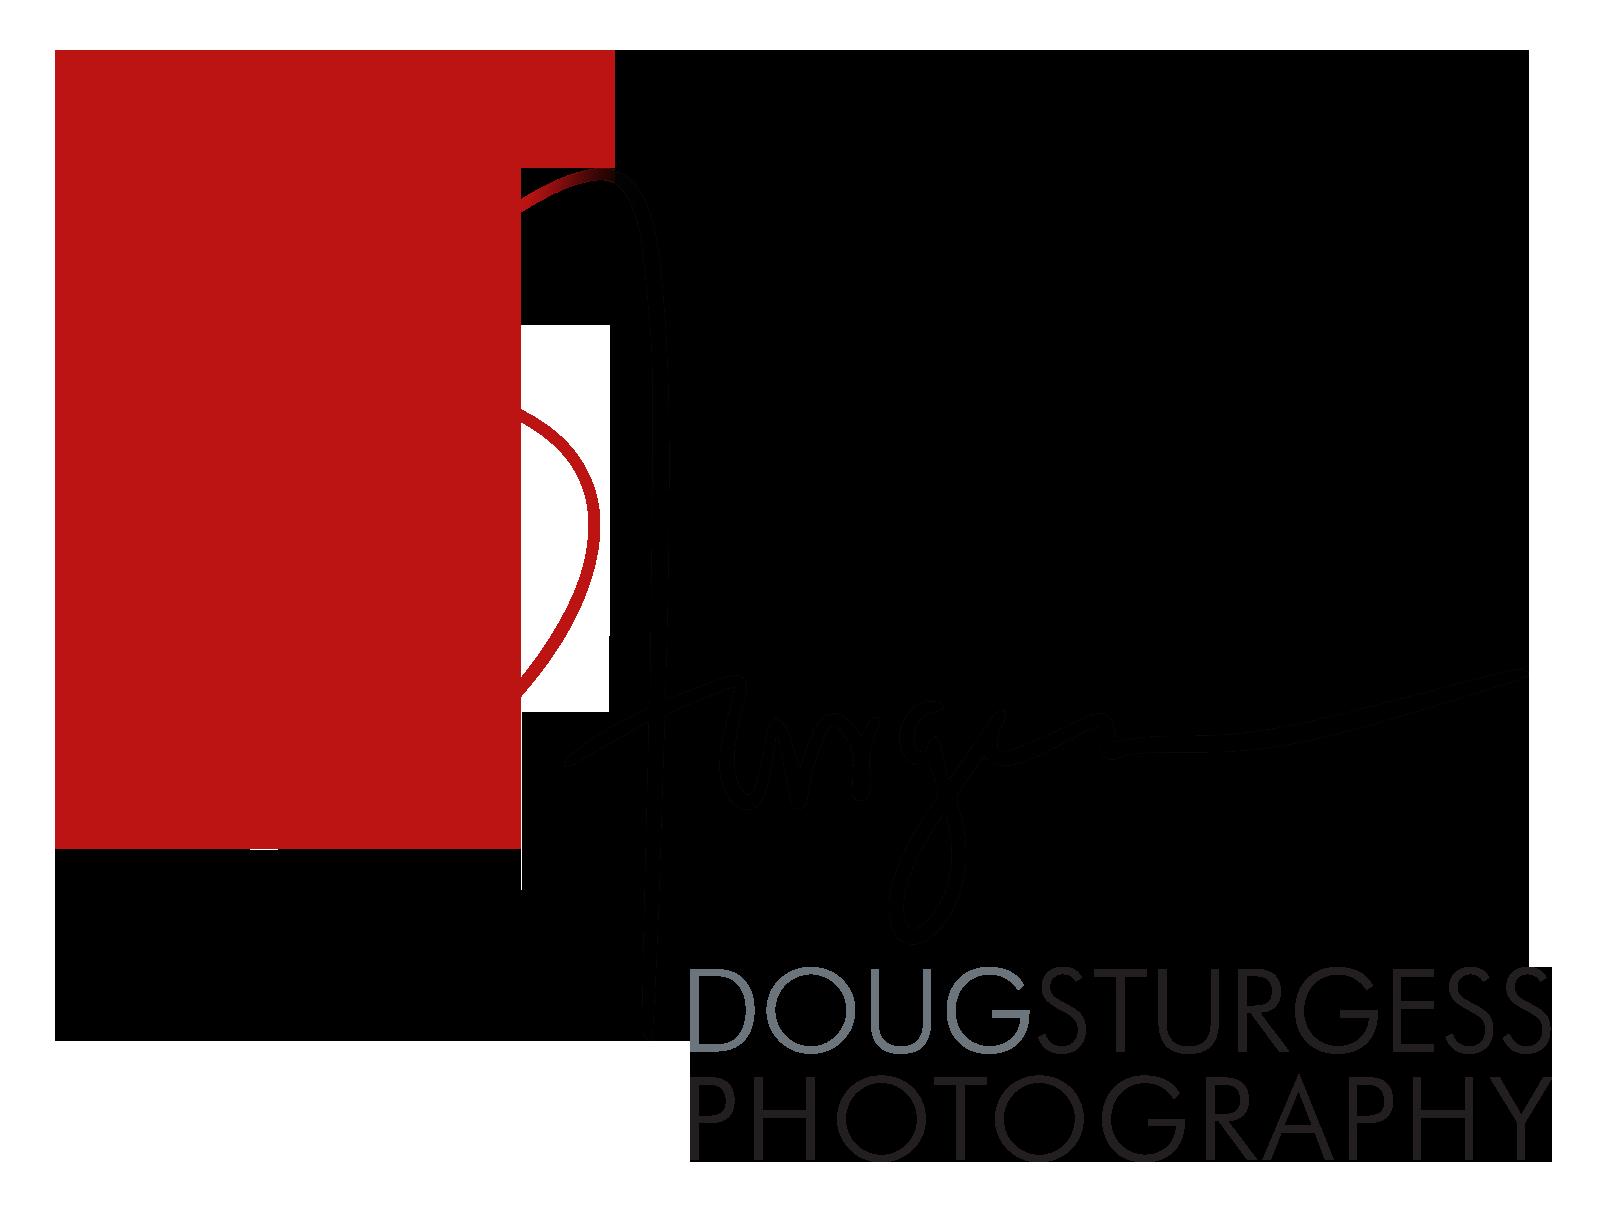 Doug Sturgess